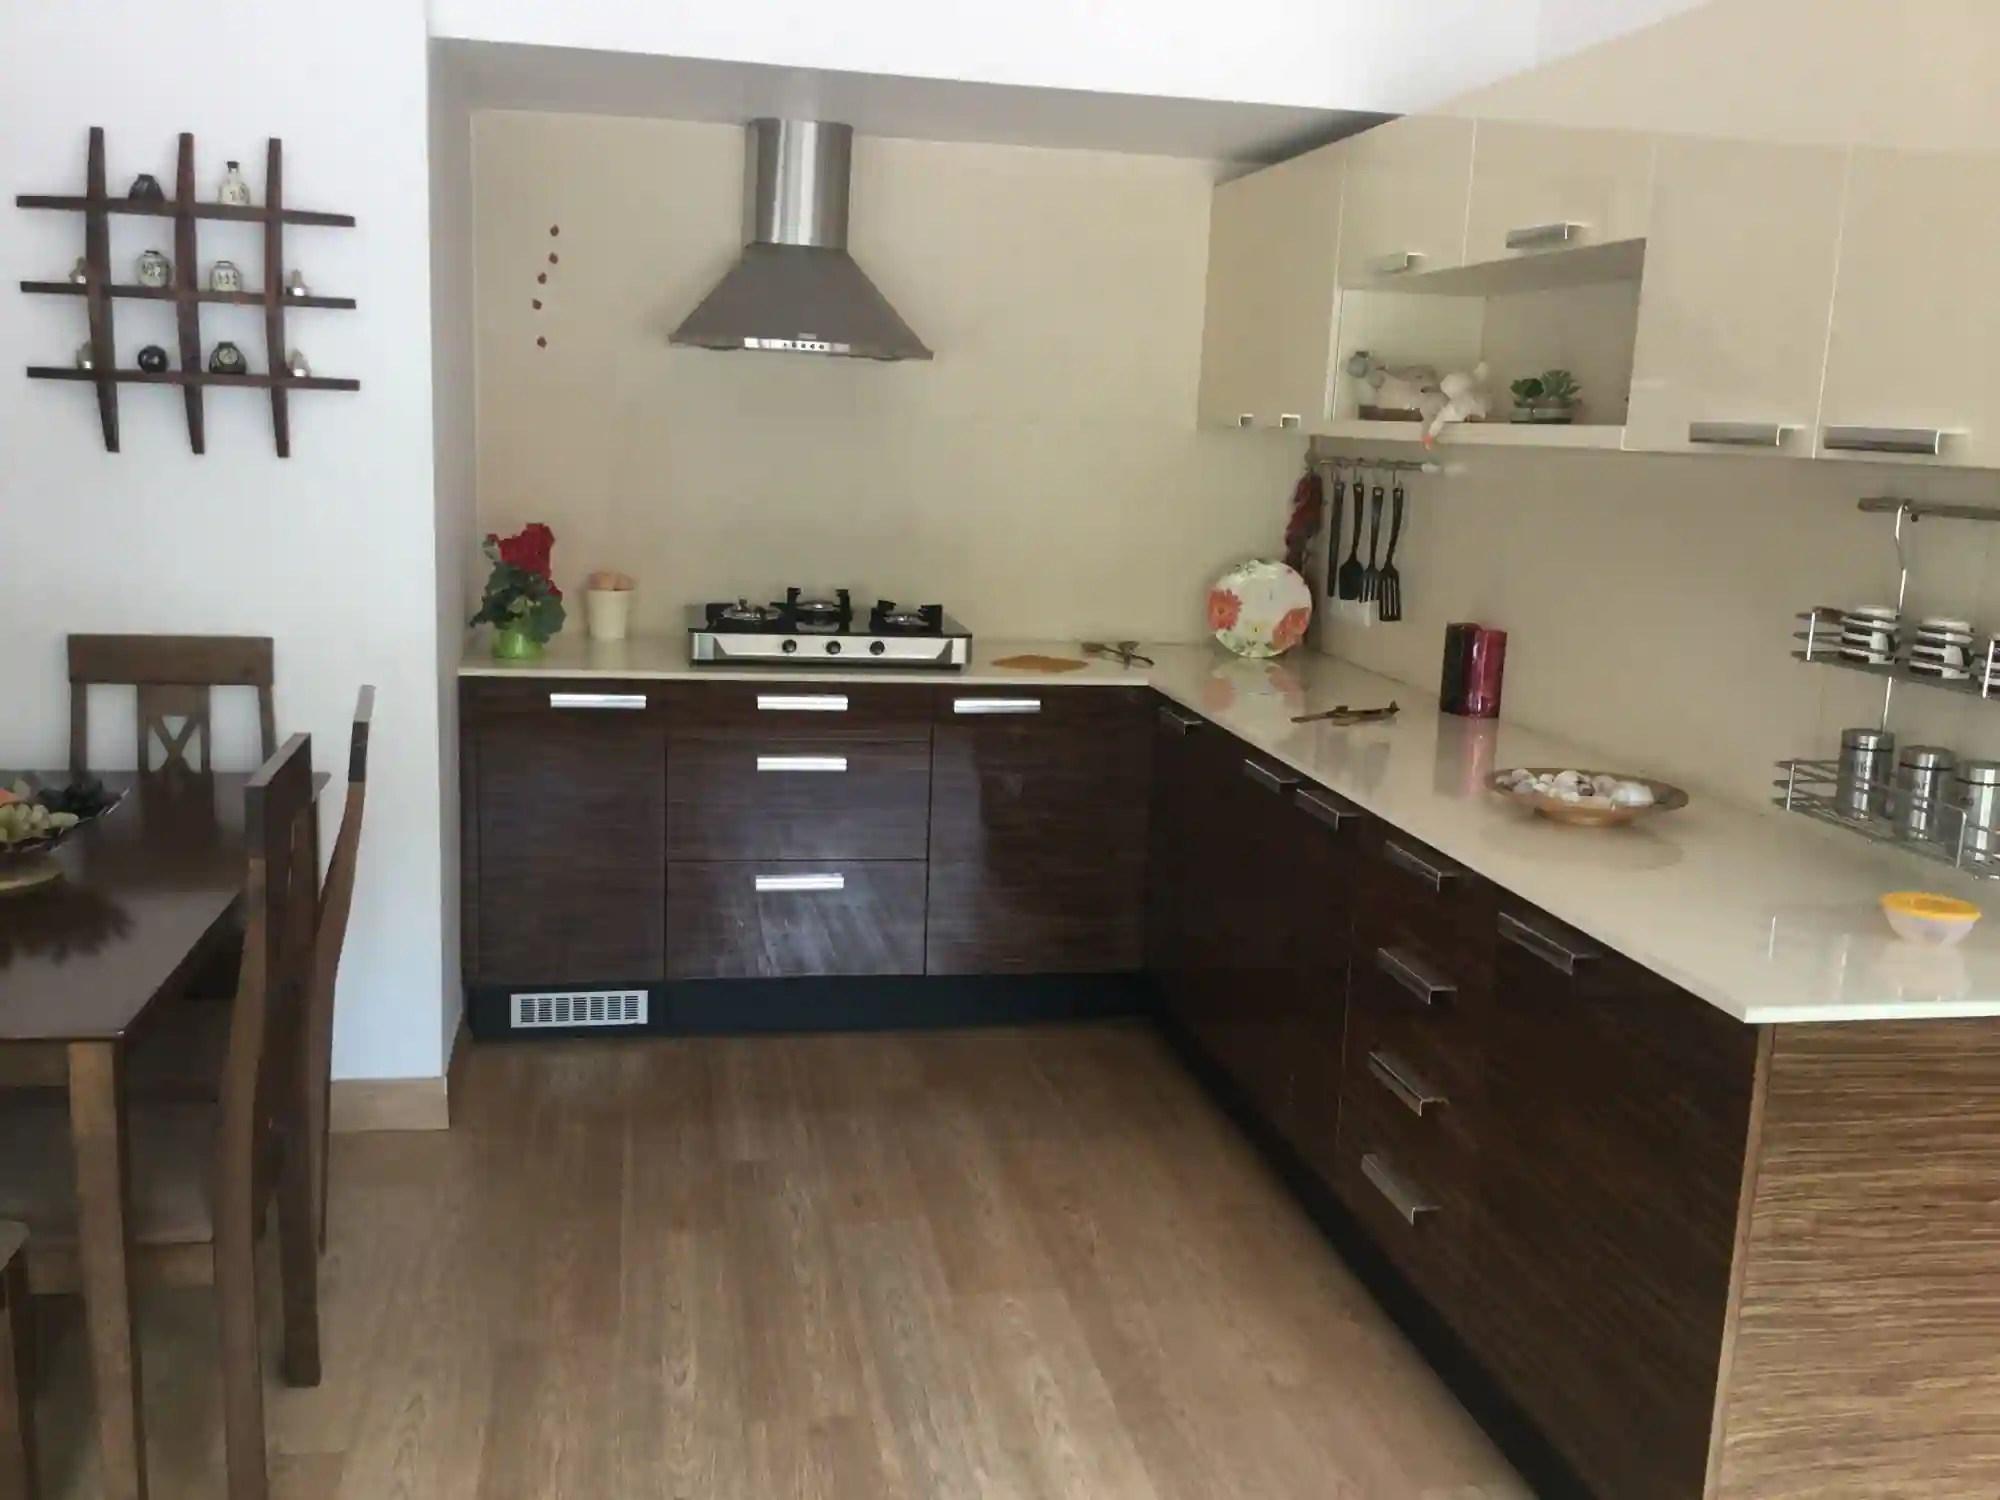 kitchen experts mosaic floor tiles k designs photos kadavanthara ernakulam pictures modular kitchens dealers